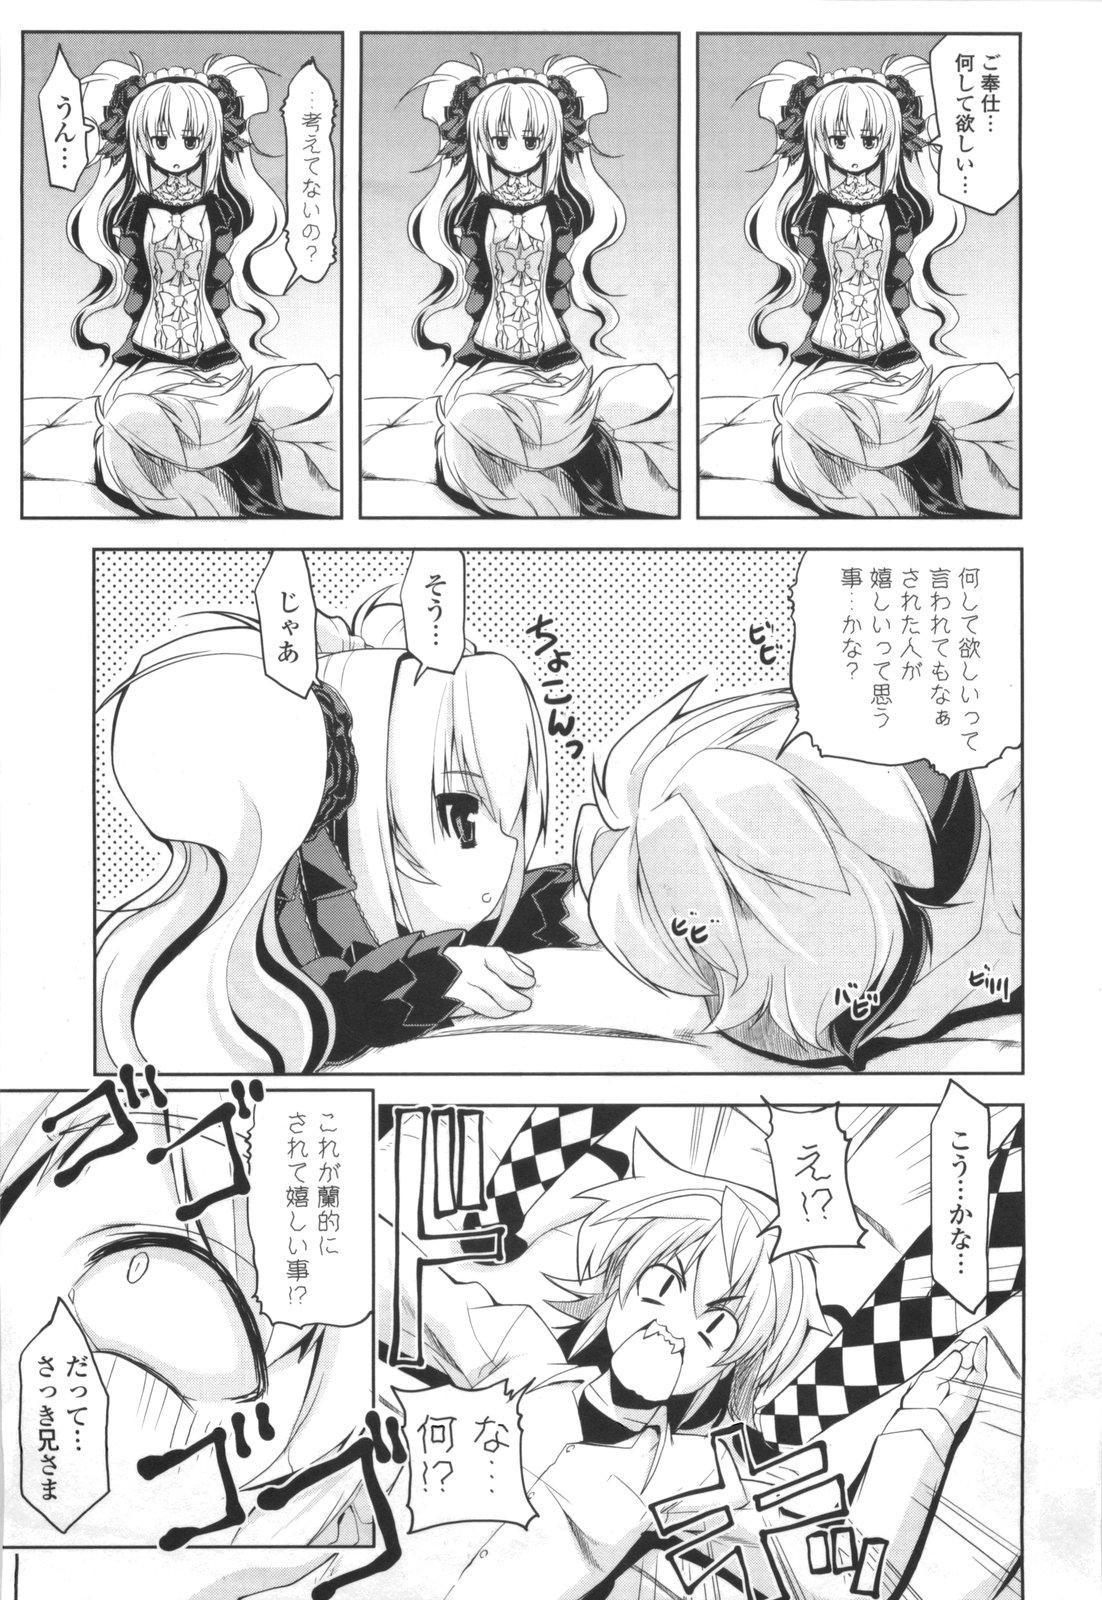 [Gyonikun] Gosyujin-sama Senyou!? Ami-sama Senyou 102